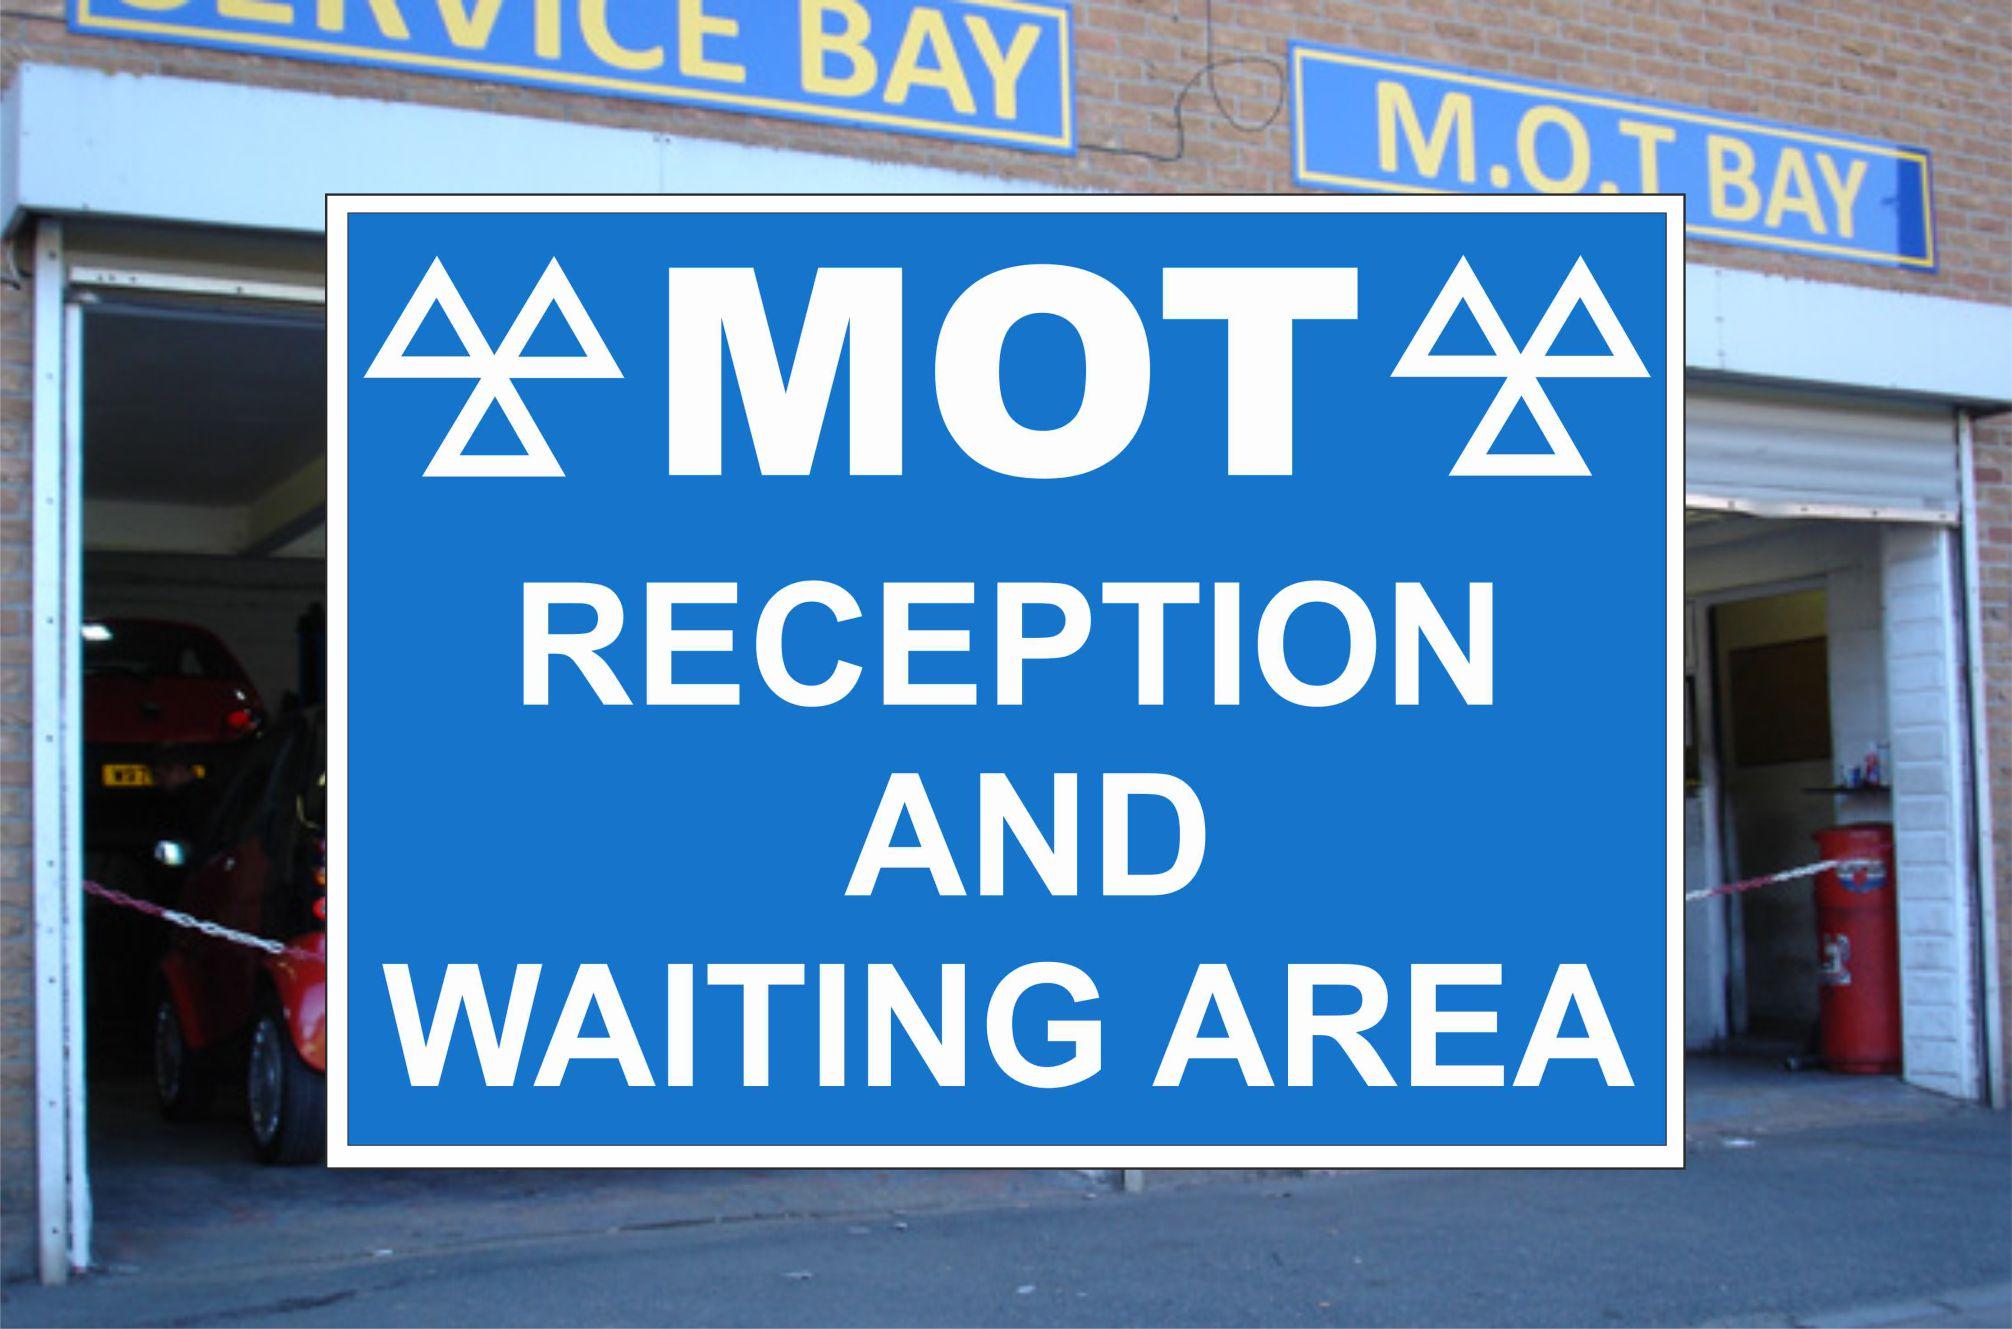 Vehicle & Garage Forecourt Sign